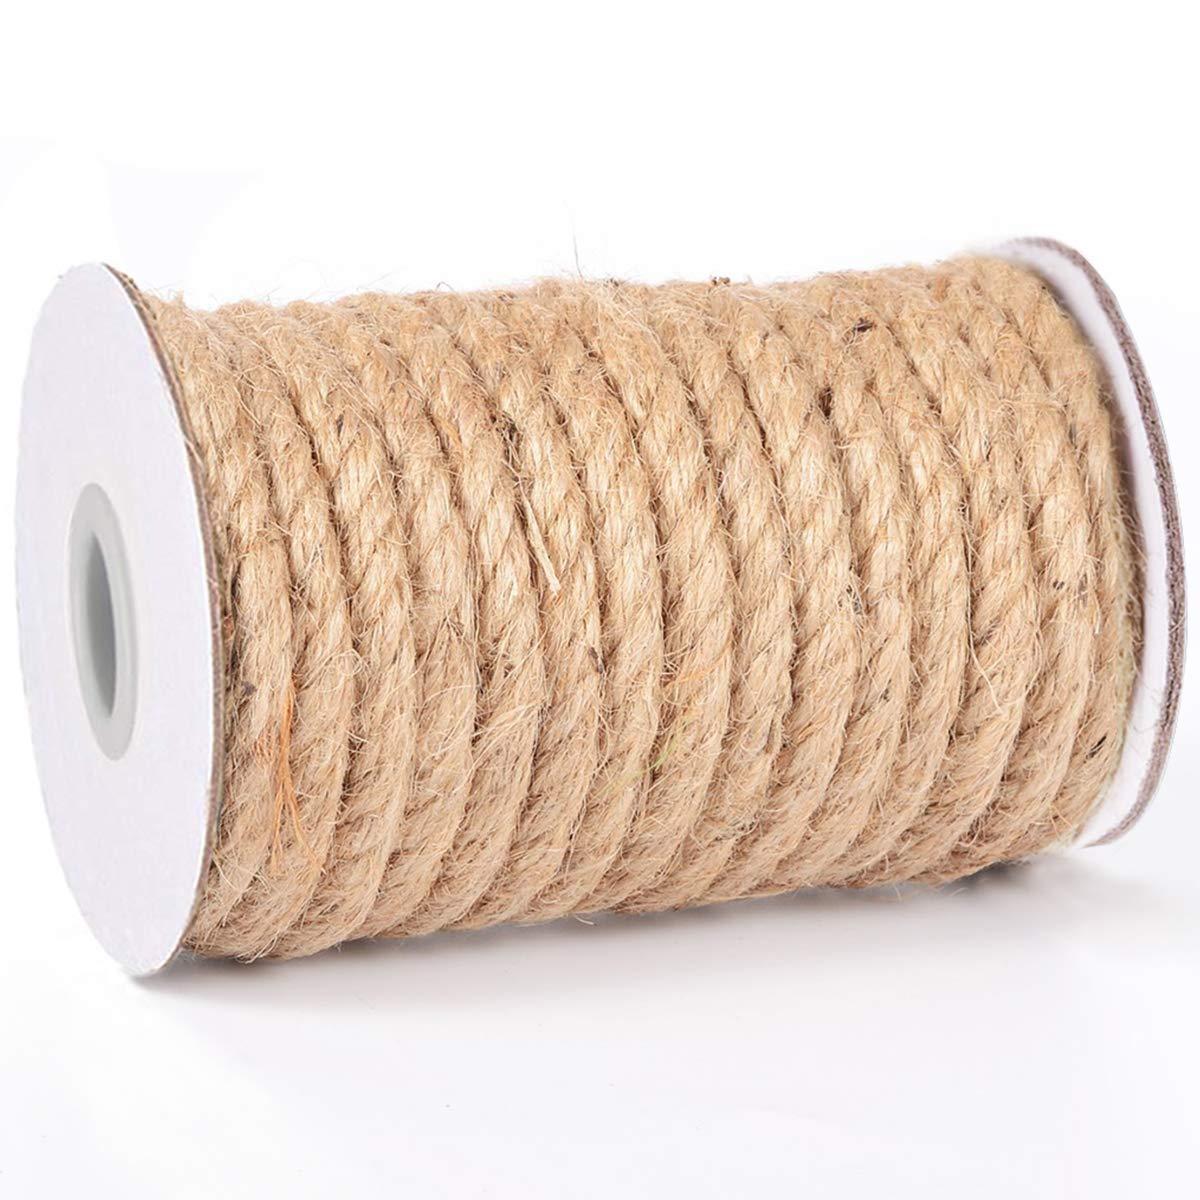 HOMYHOME Jute Rope Natural Jute Twine 8 mm Hemp Rope Cord Craft for Packaging Arts,Crafts Decoration Bundling Gardening Home 50 Feet